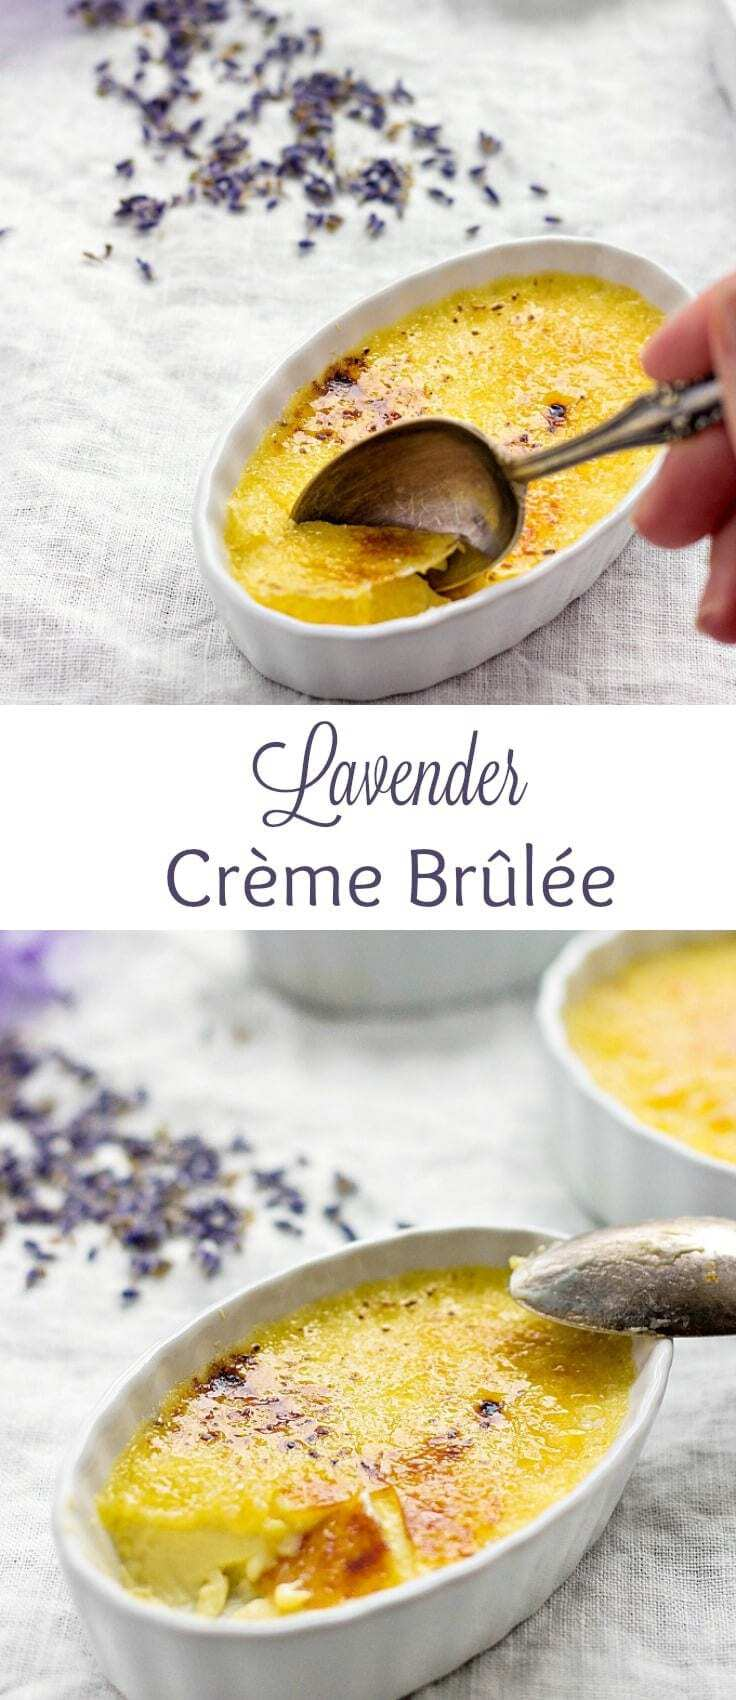 easy dessert | New Year's Eve dessert | creme brulee recipe | lavender desserts